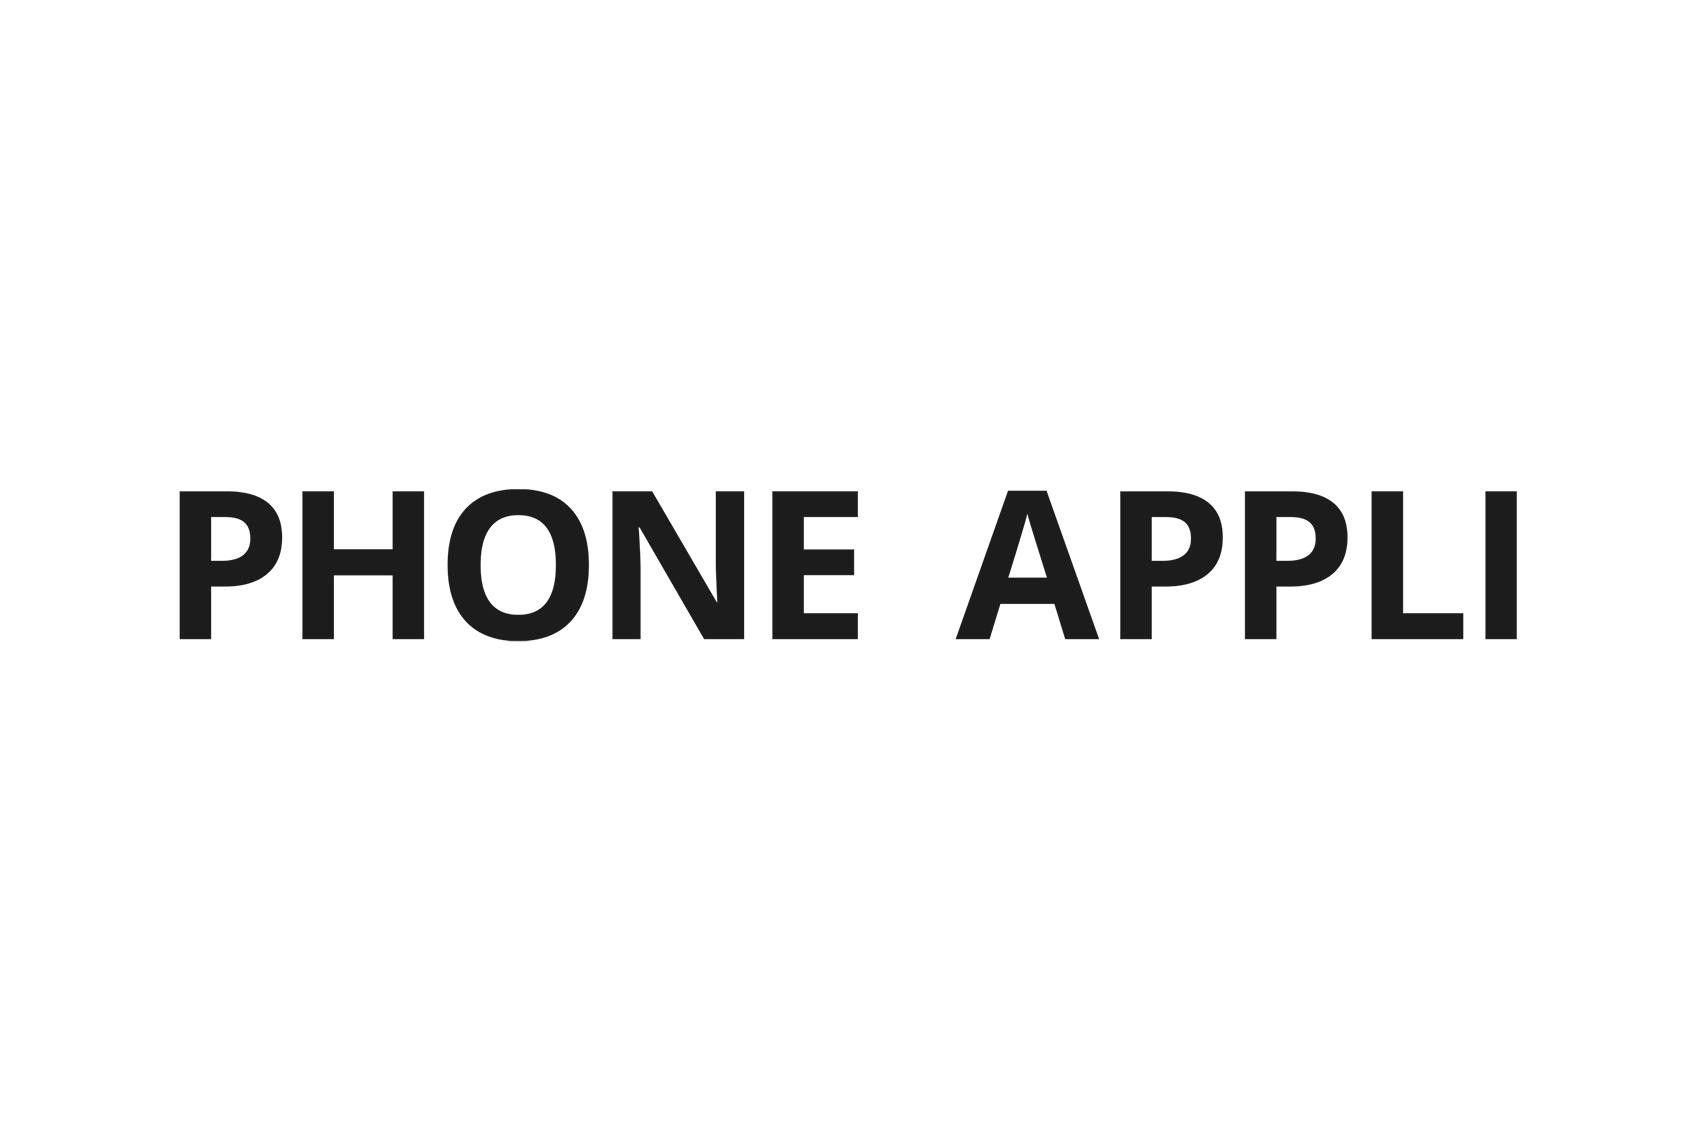 株式会社PHONE APPLI